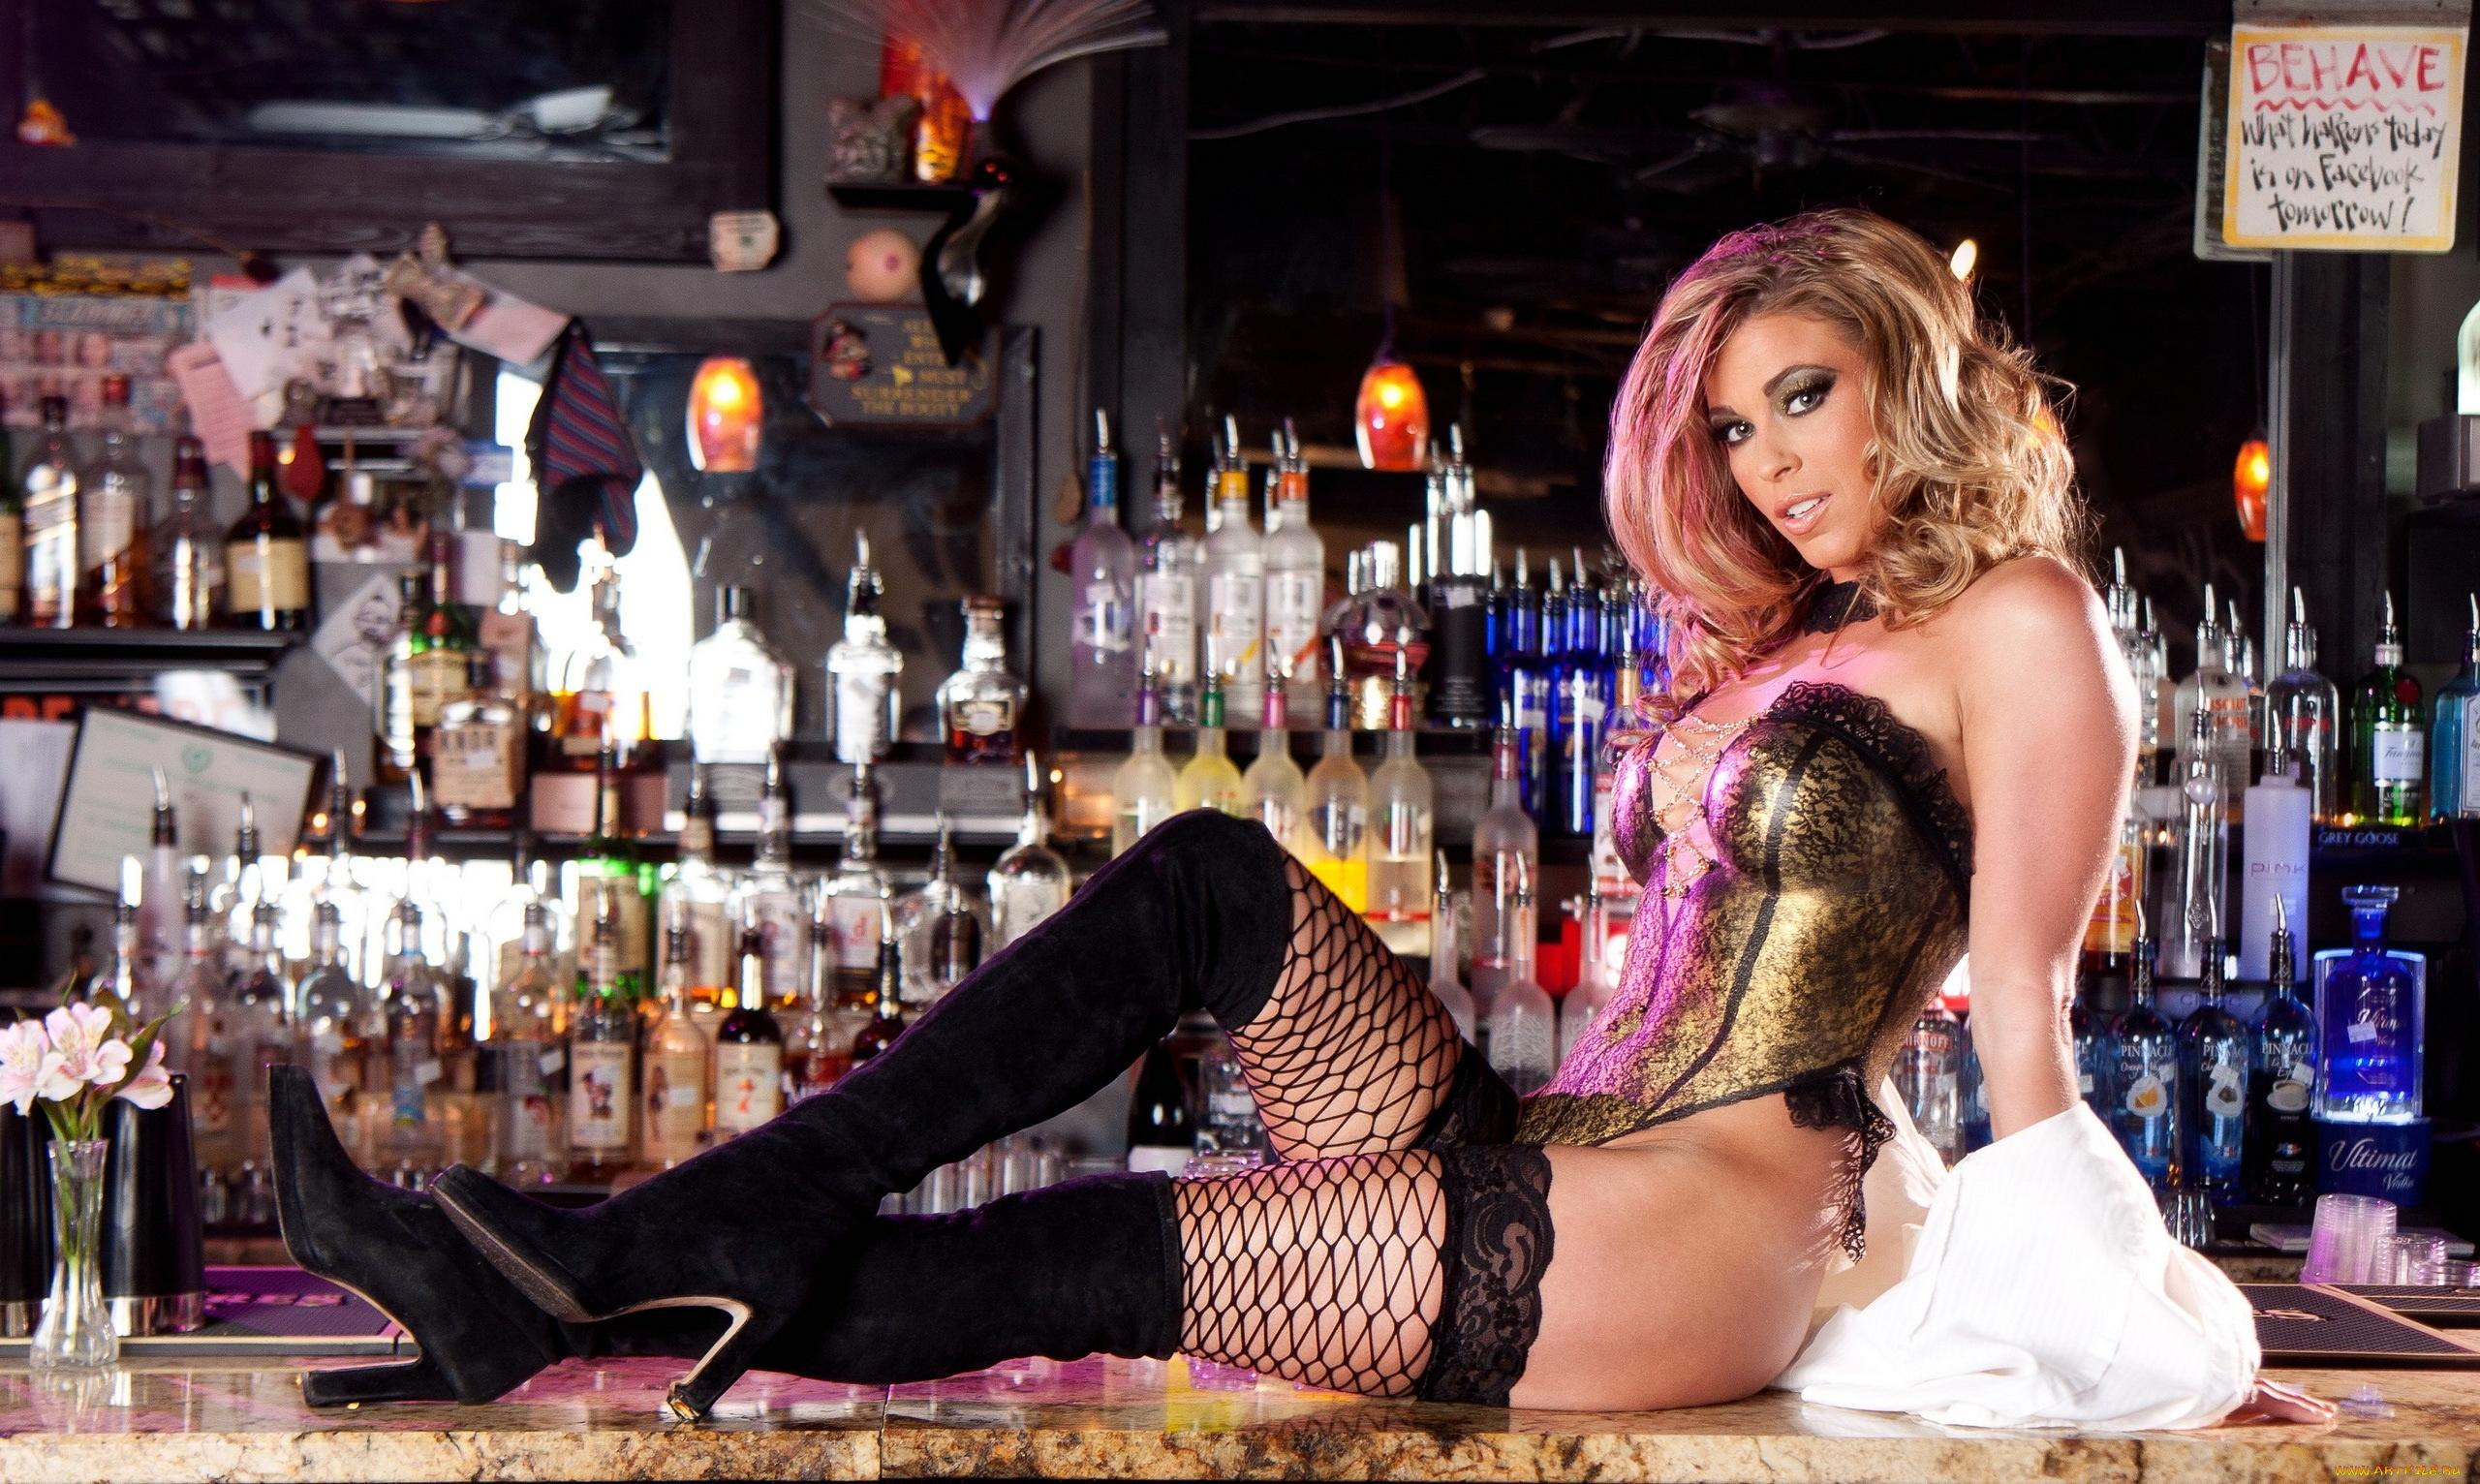 kartinki-striptiz-na-barnoy-stoyke-porno-s-bogatenkimi-telkami